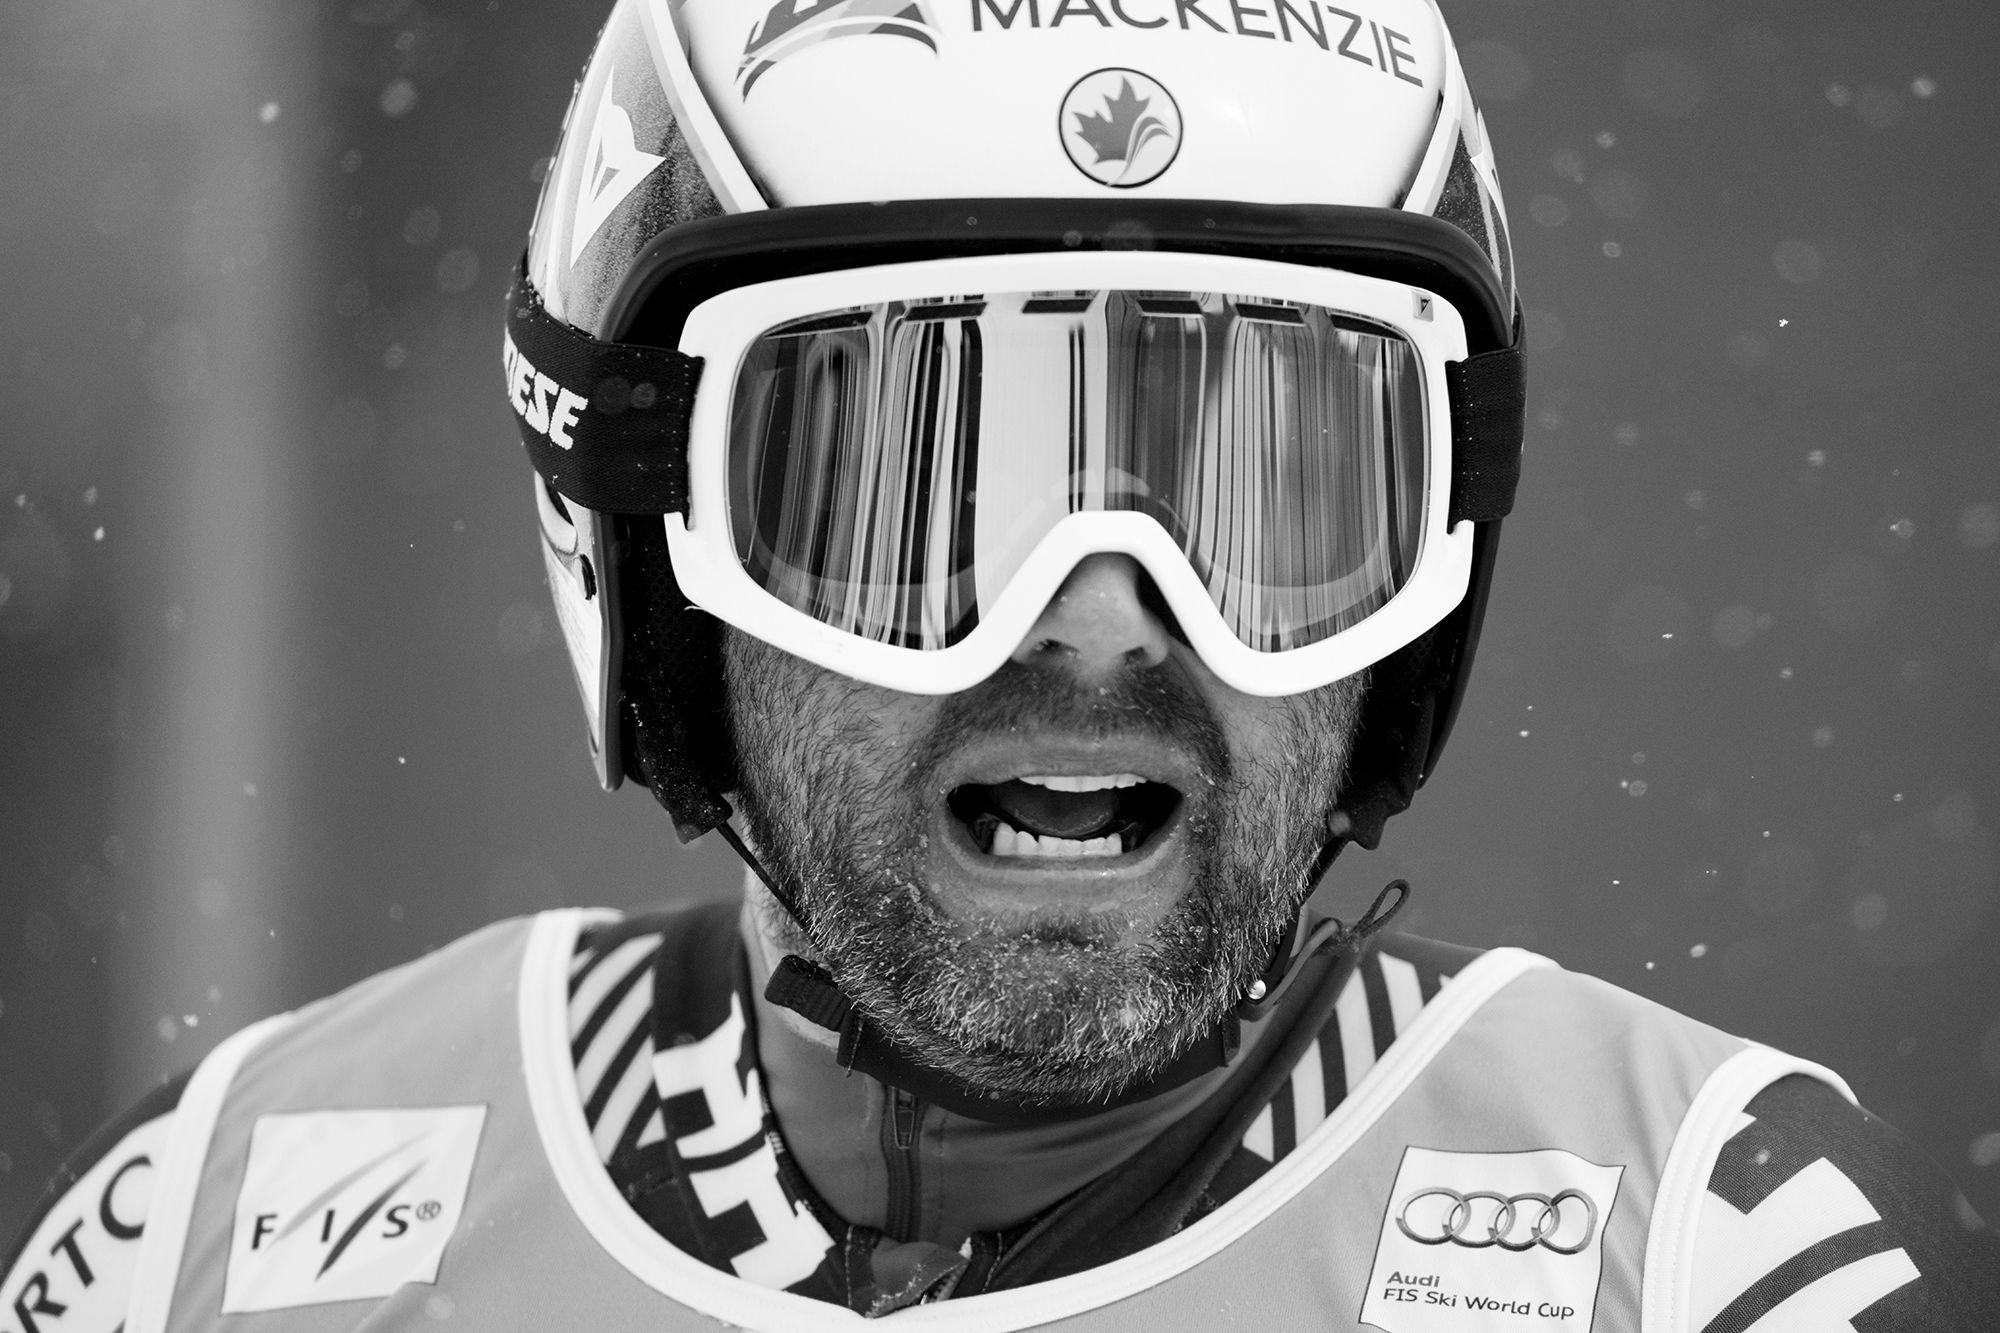 Gian Paul Lozza Portraits der besten Skirennläufer